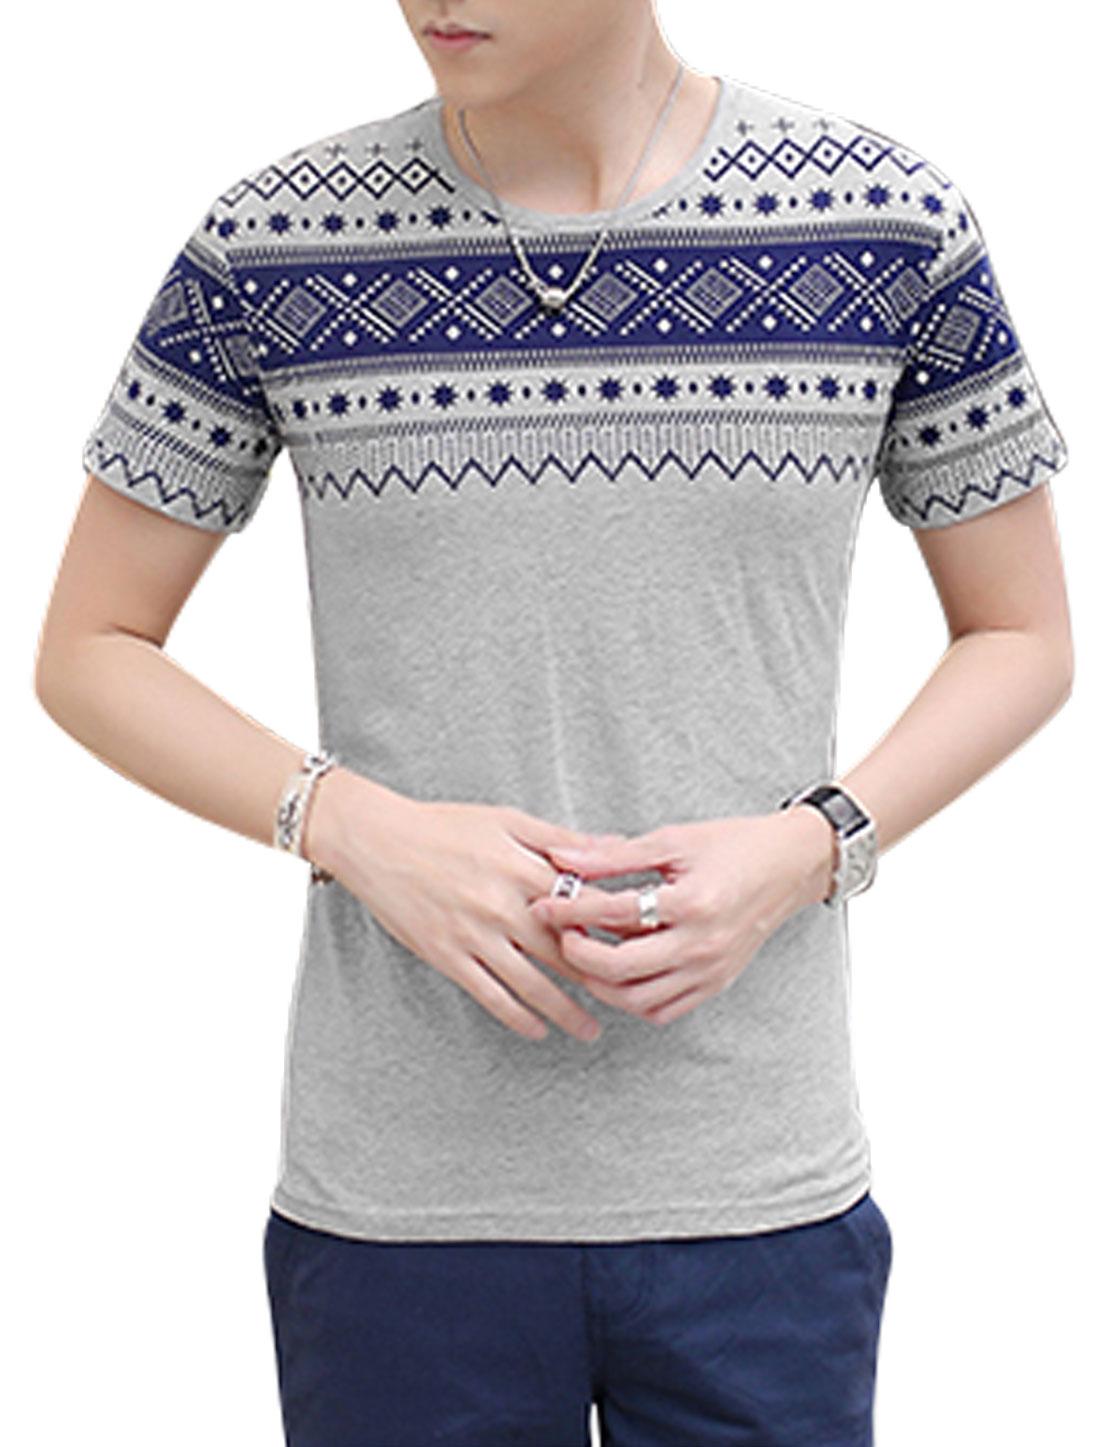 Man Short Sleeves Geometric Prints Slipover T-Shirts Gray M